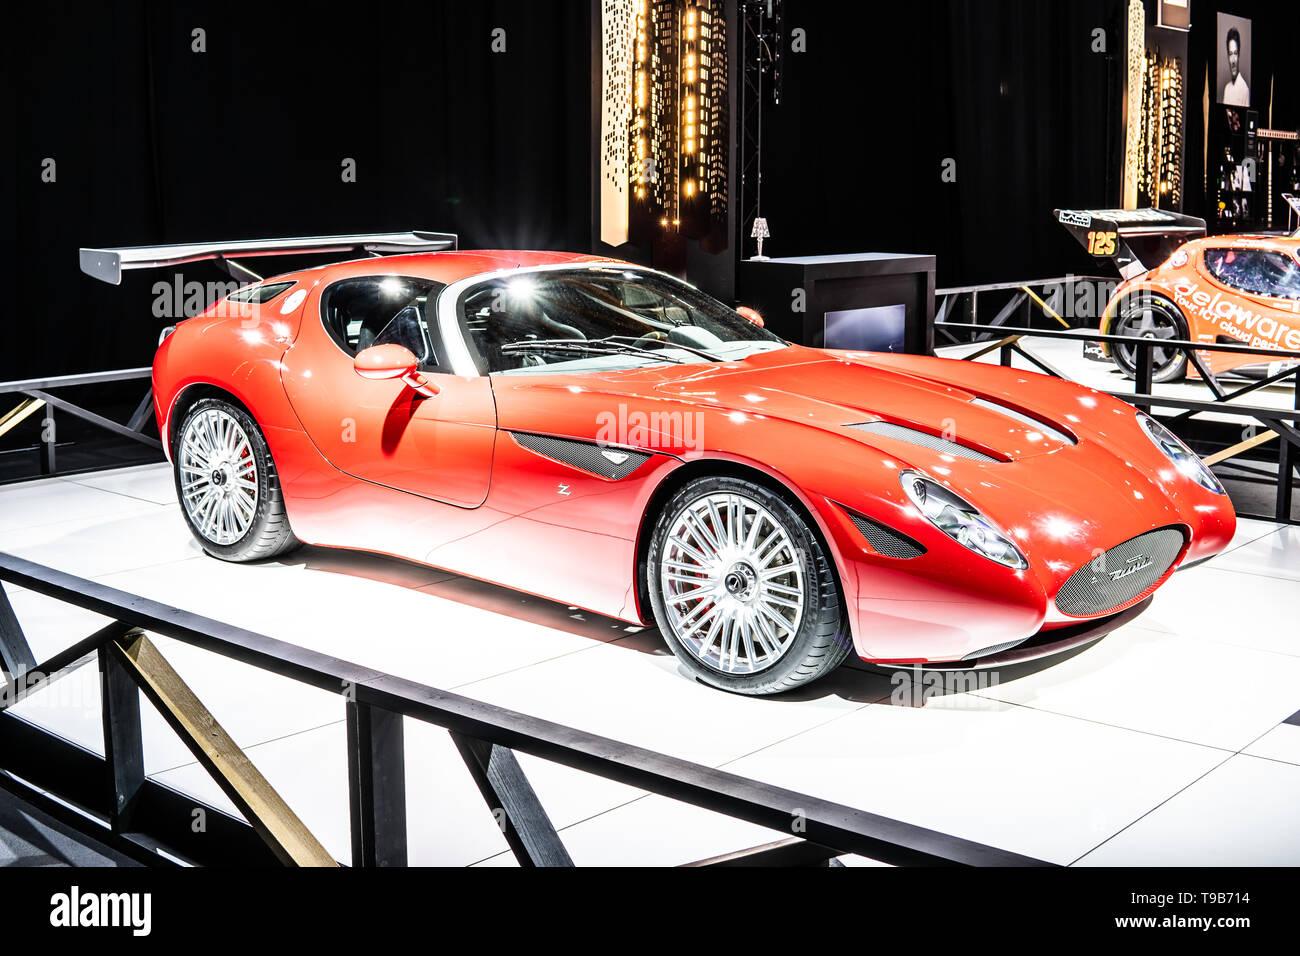 Ital Designs Hong Kong maserati concept car stock photos & maserati concept car